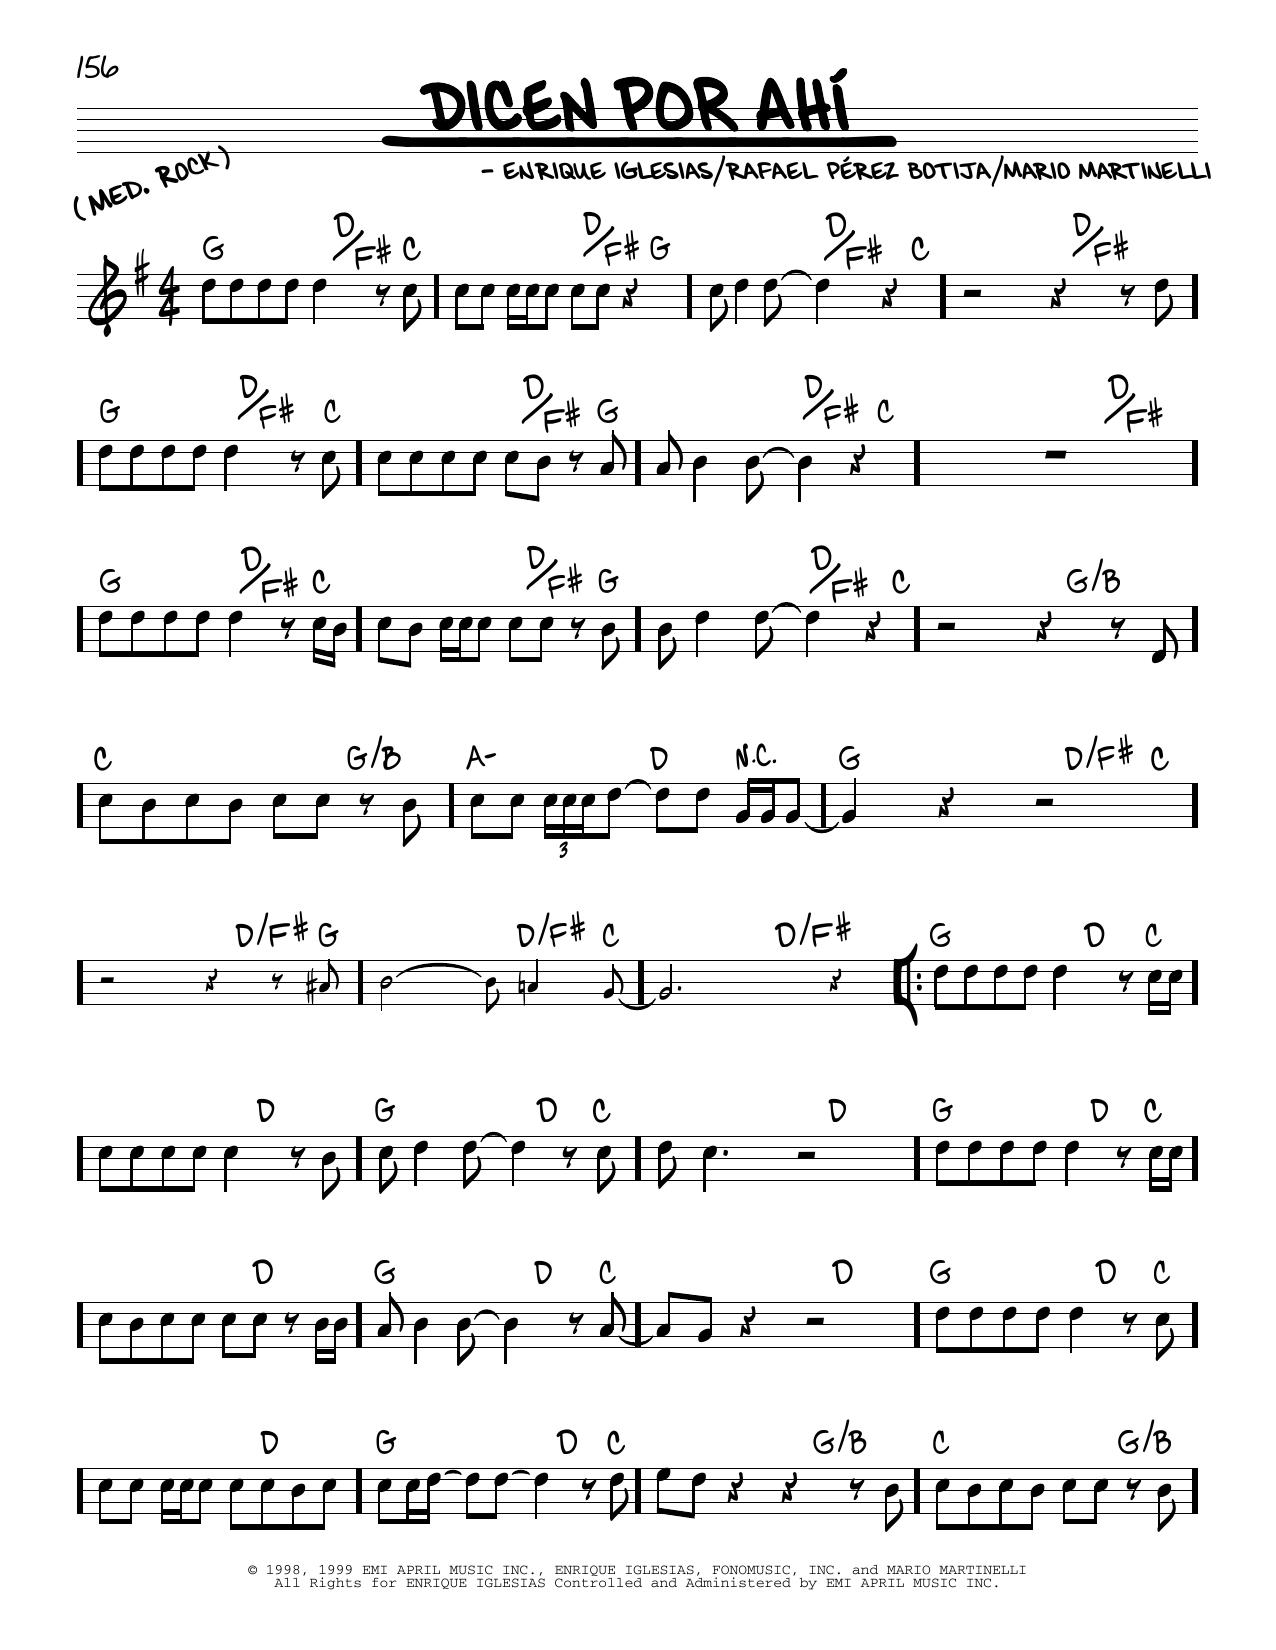 Enrique Iglesias Dicen Por Ahi sheet music notes and chords. Download Printable PDF.